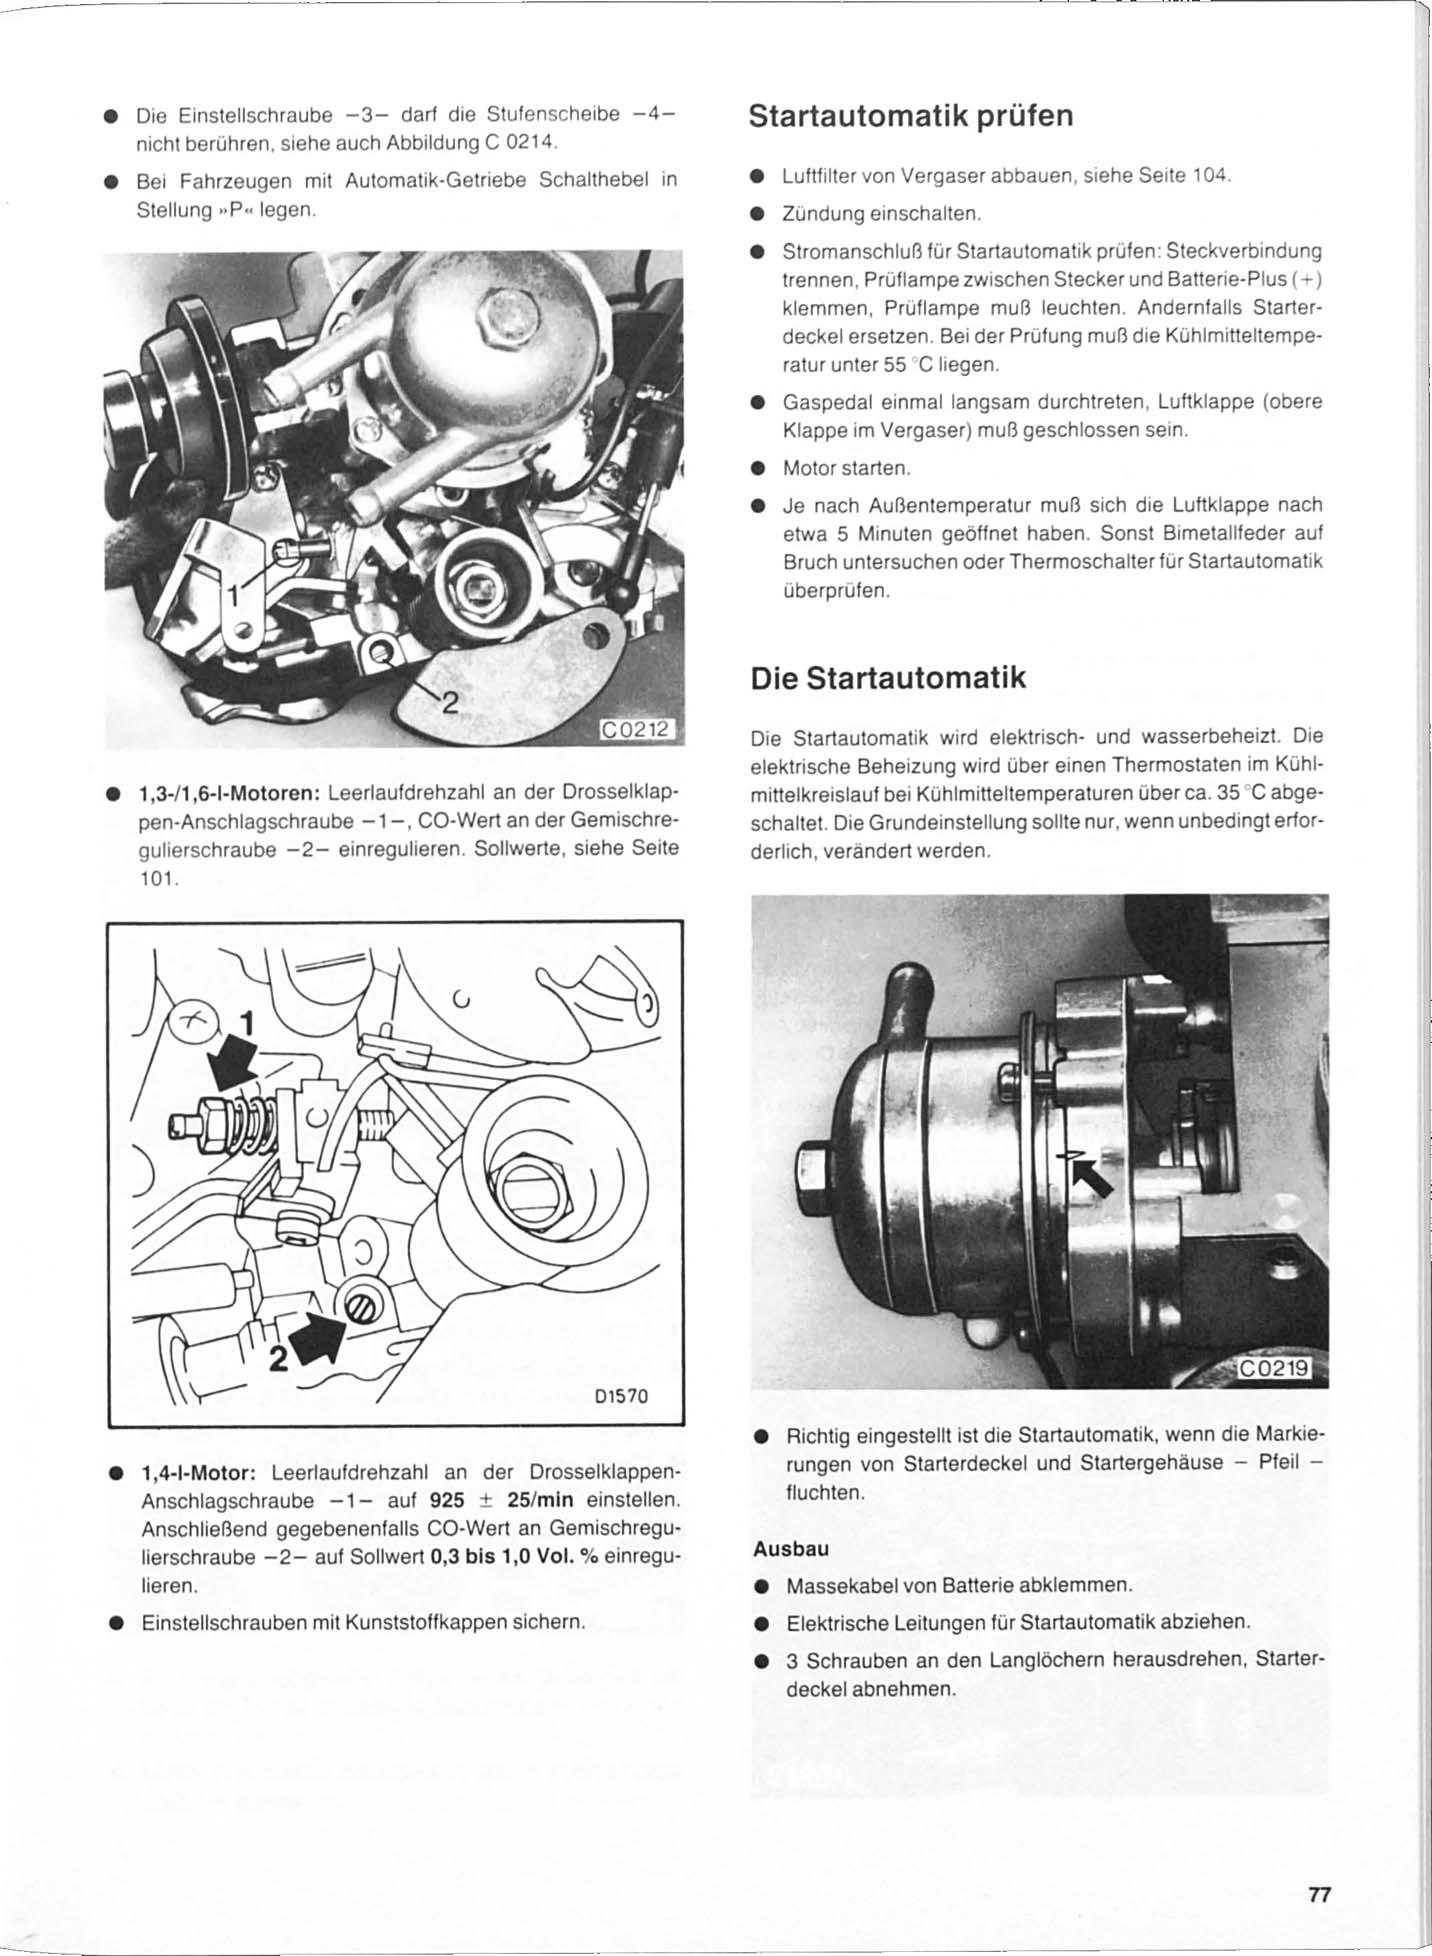 OPEL KADETT E 1984-1991 1,3l 1,4 1,6 1,8 2,0l Reparaturanleitung SWG 51